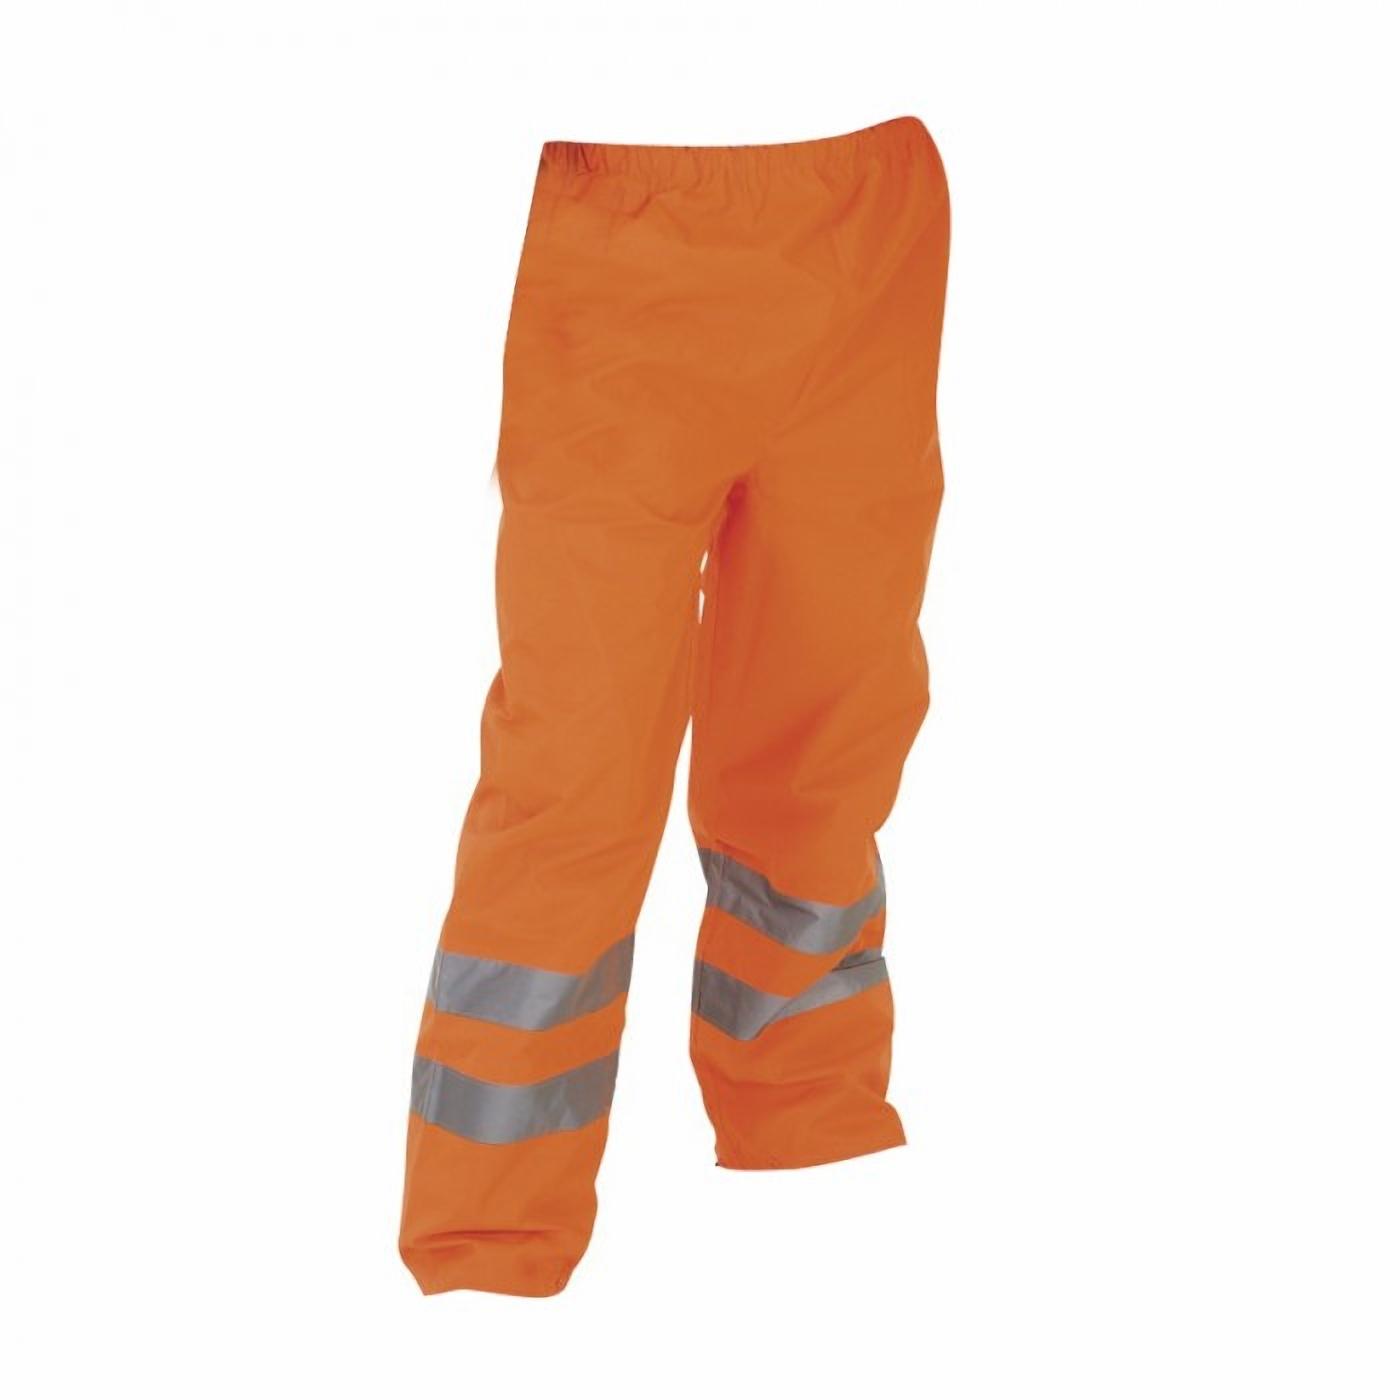 Yoko Mens Hi-Vis Waterproof Contractors Trousers / Pants (Pack of 2) (L) (Hi Vis Orange)